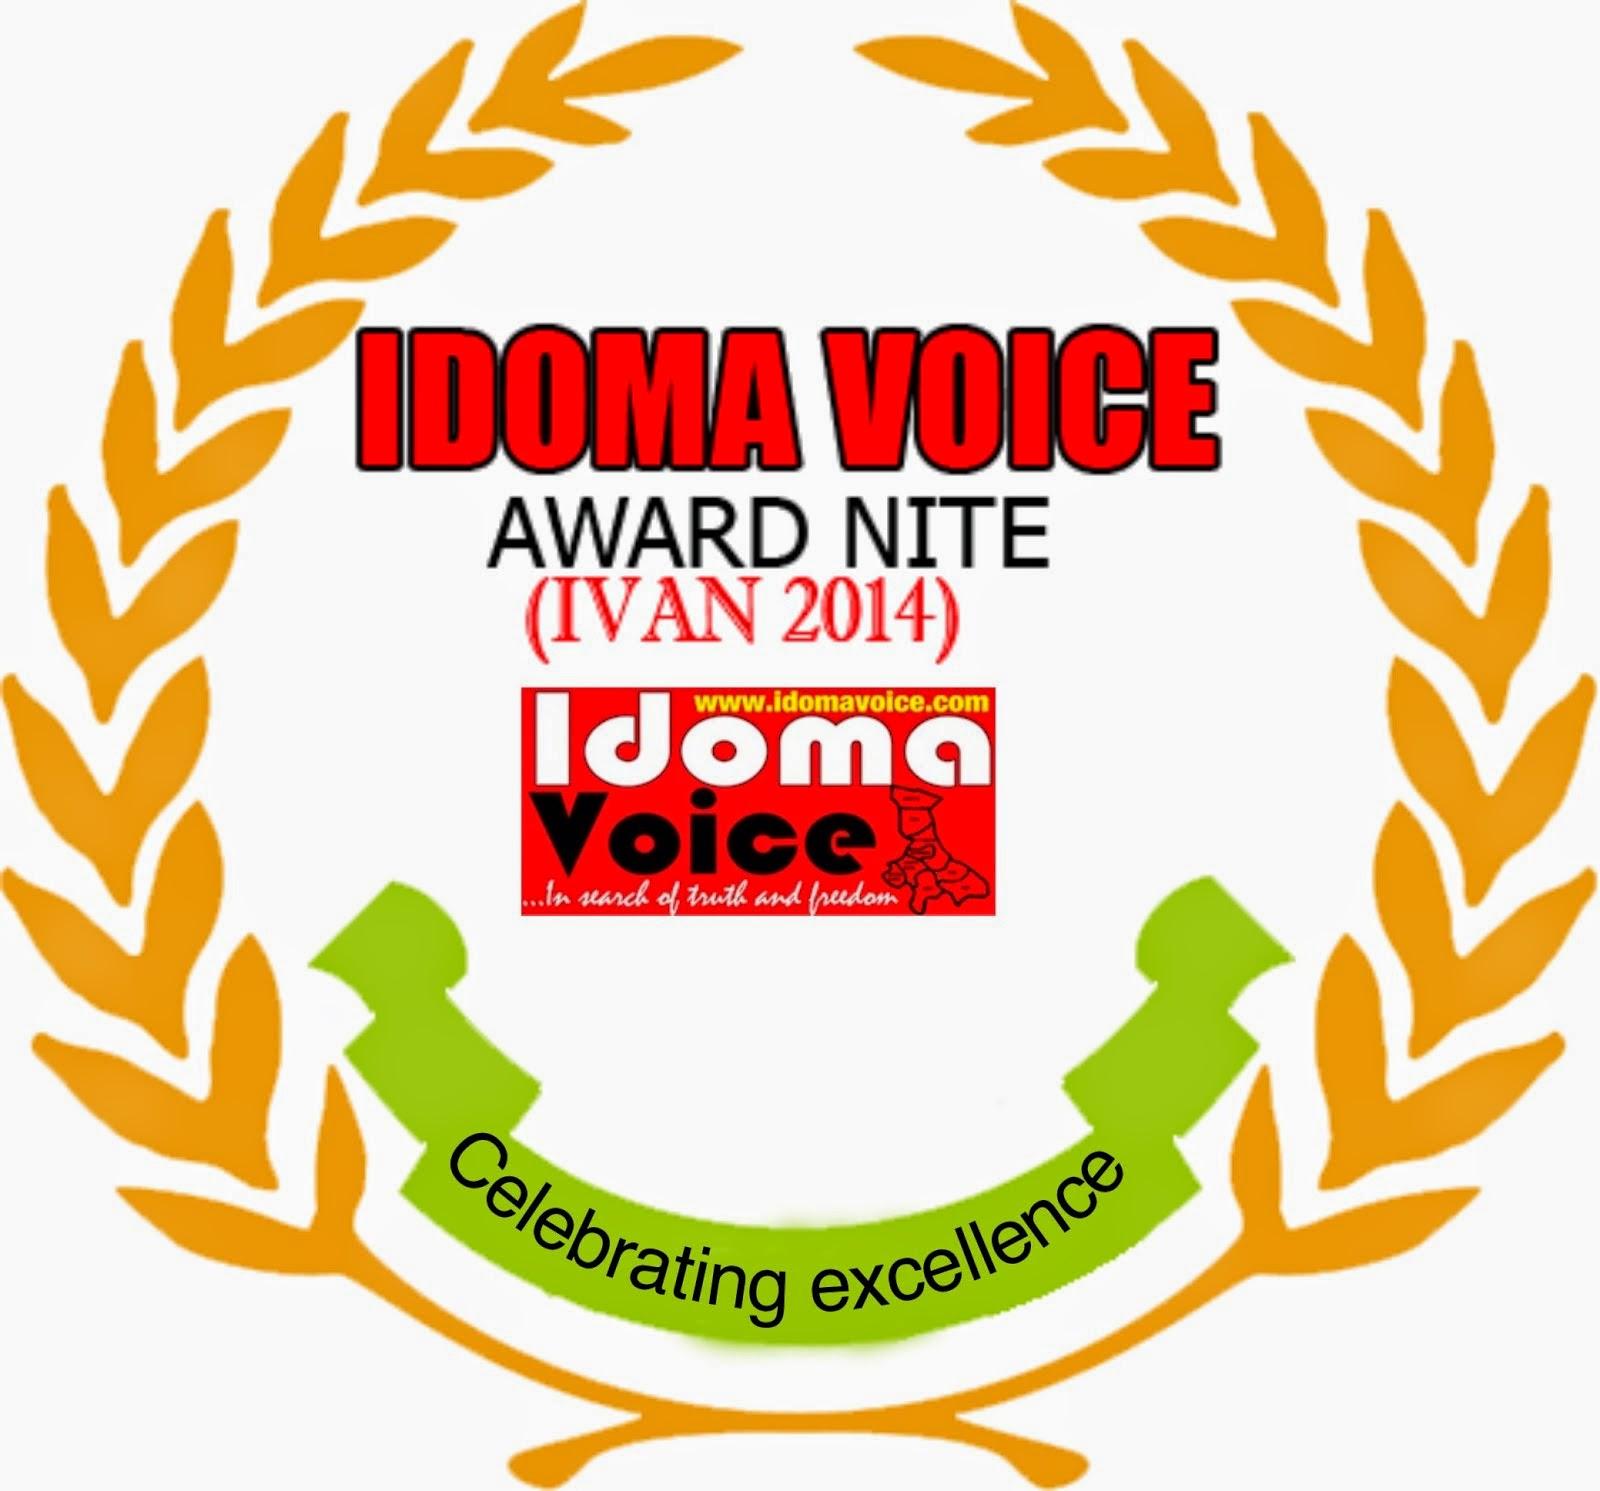 IDOMA VOICE AWARD NITE (IVAN 2014)